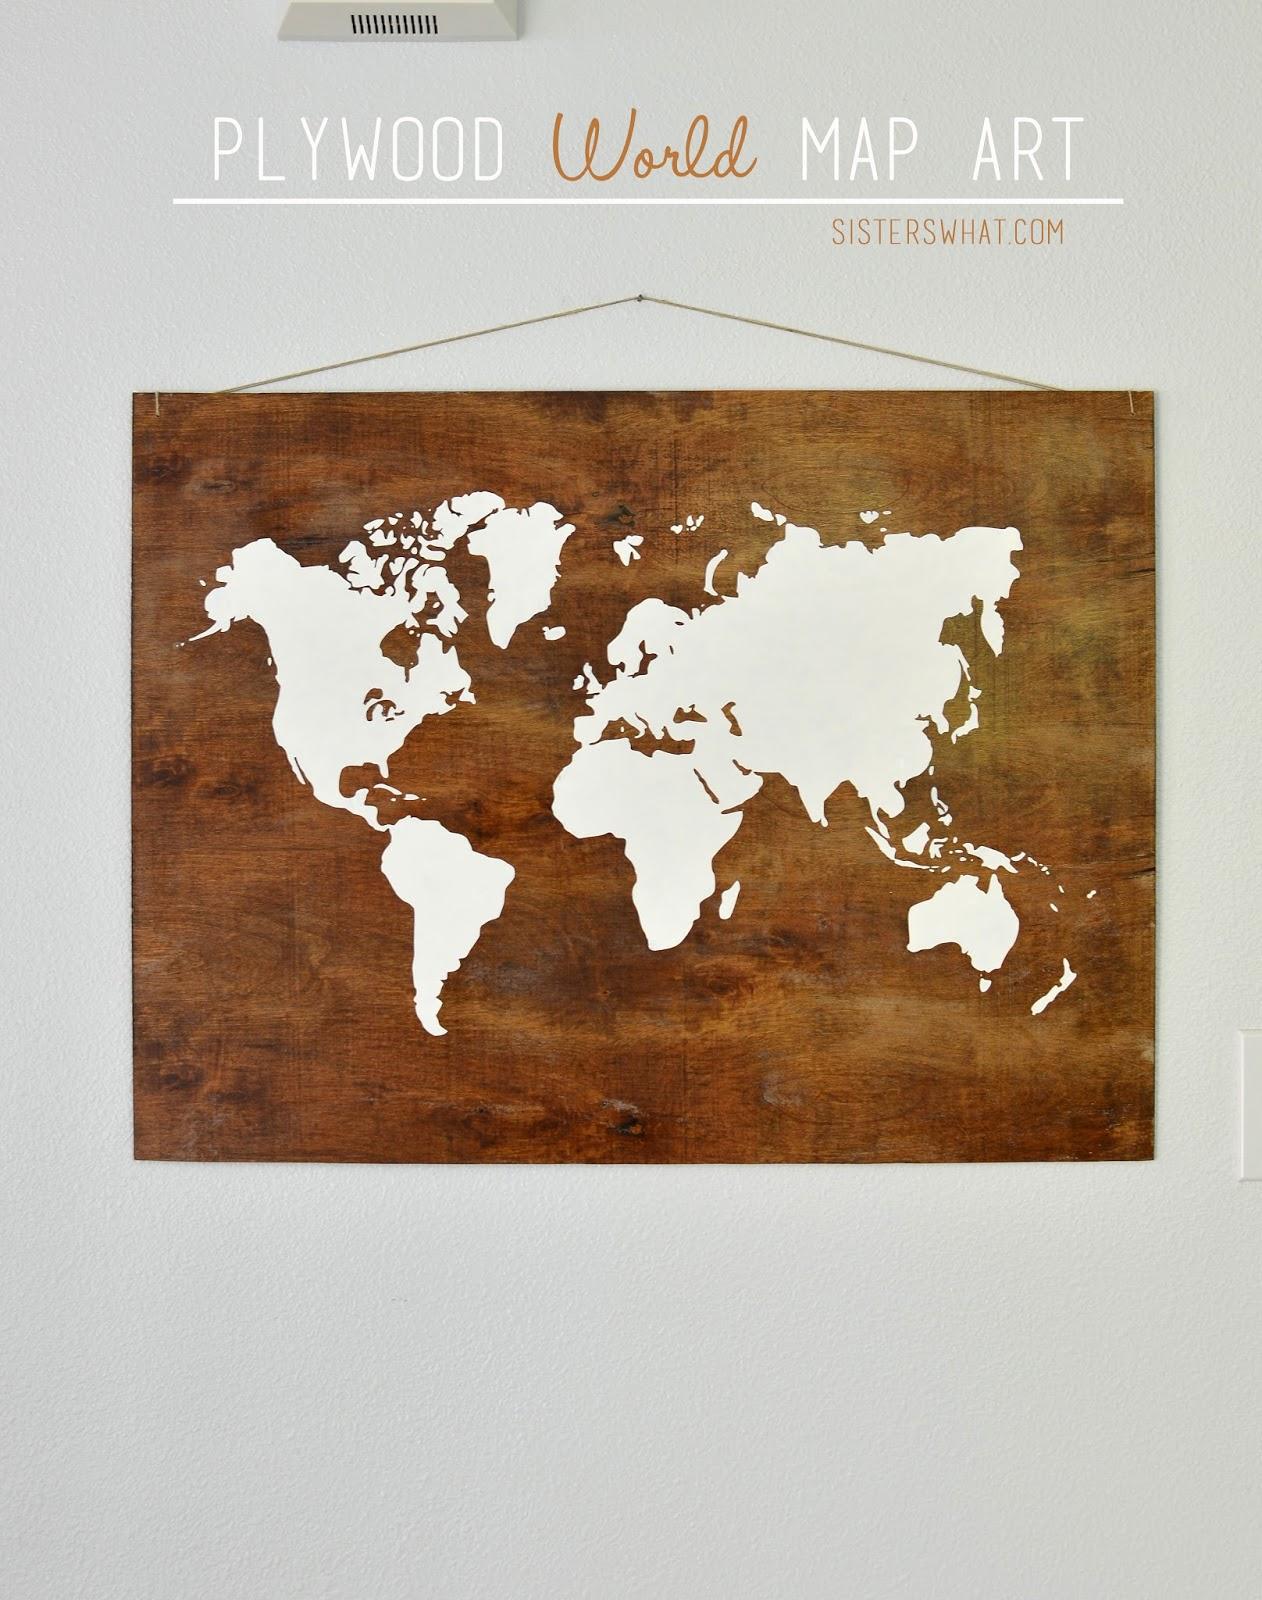 Plywood World Map Art